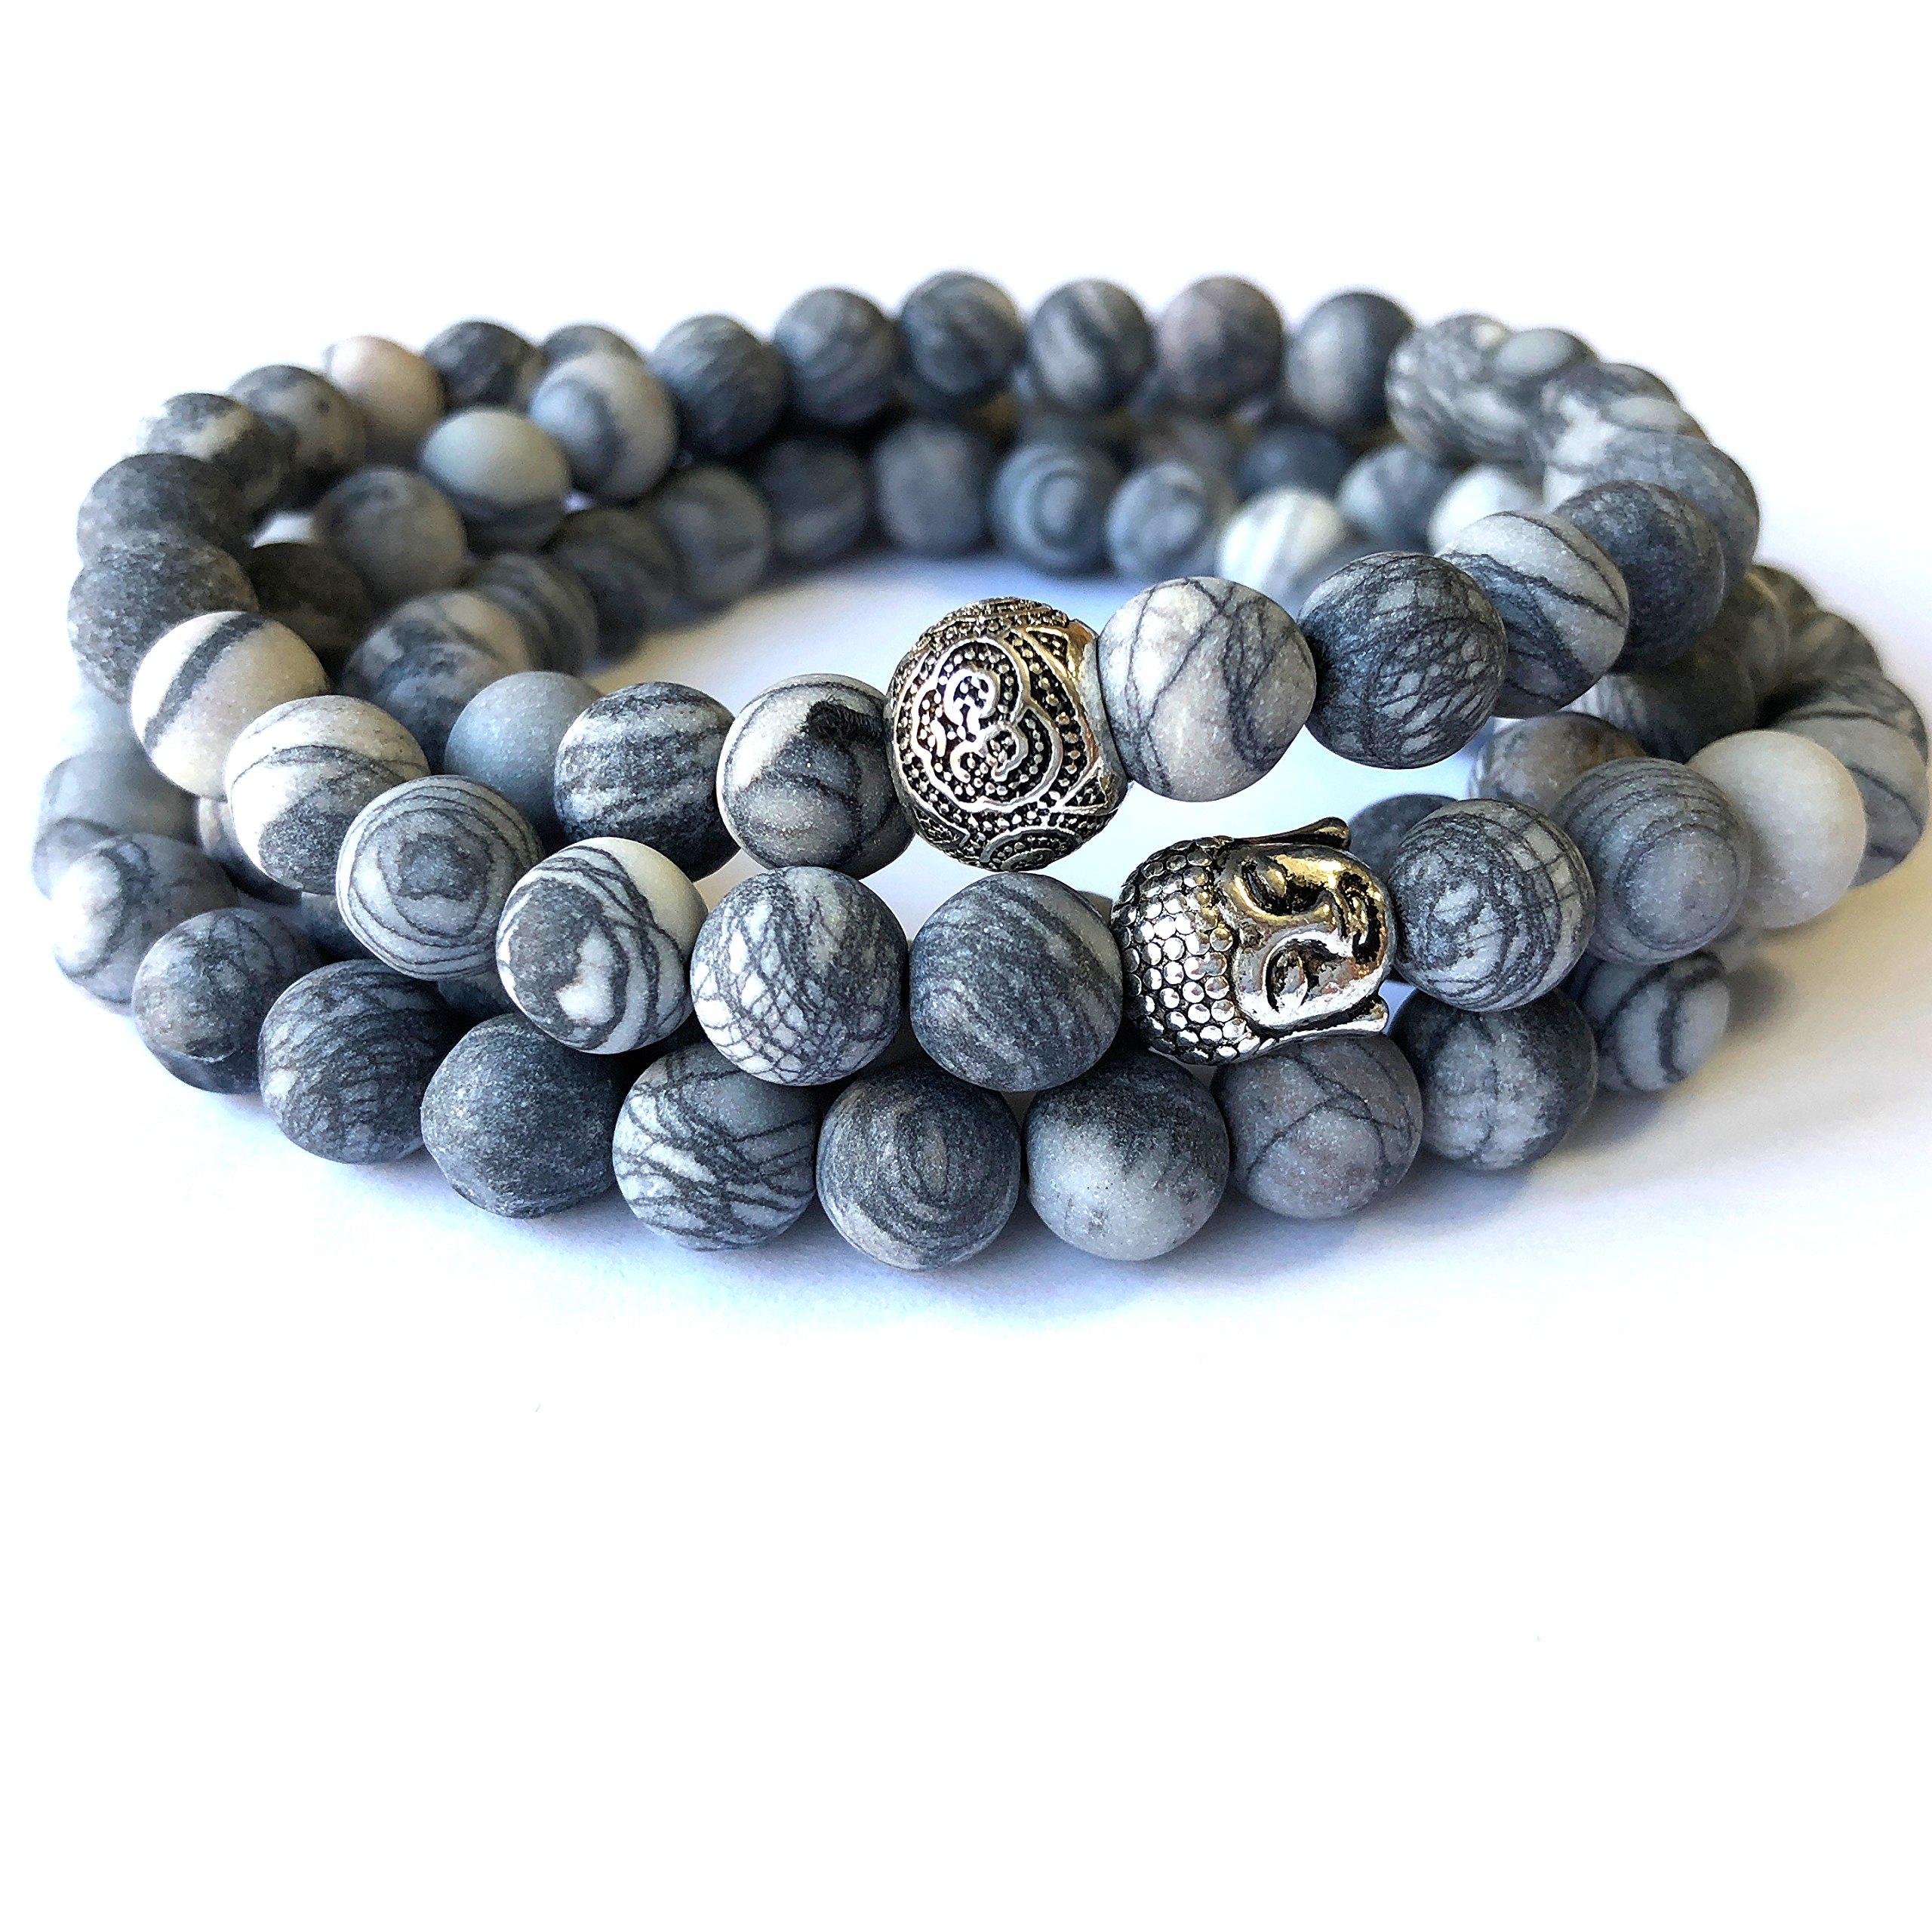 Agar Creations - 108 Bead Picasso Jasper 8mm Mala - Buddha Prayer Beads - Yoga Meditation Mala Bracelet Necklace - Healing Stone